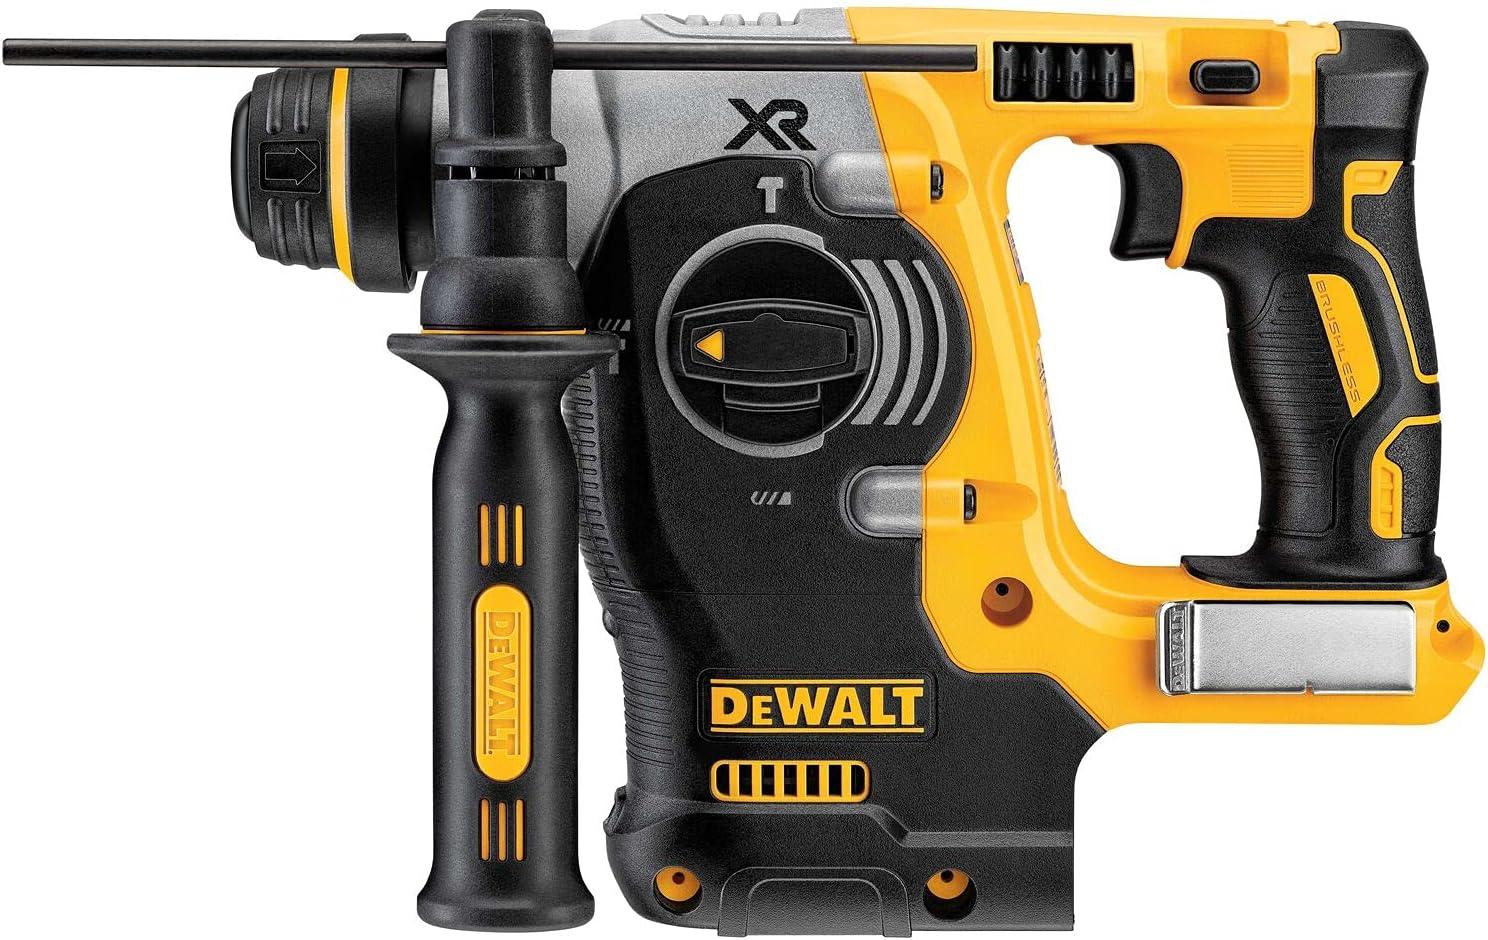 DeWalt DCH273B SDS Rotary Cordless Hammer Drill